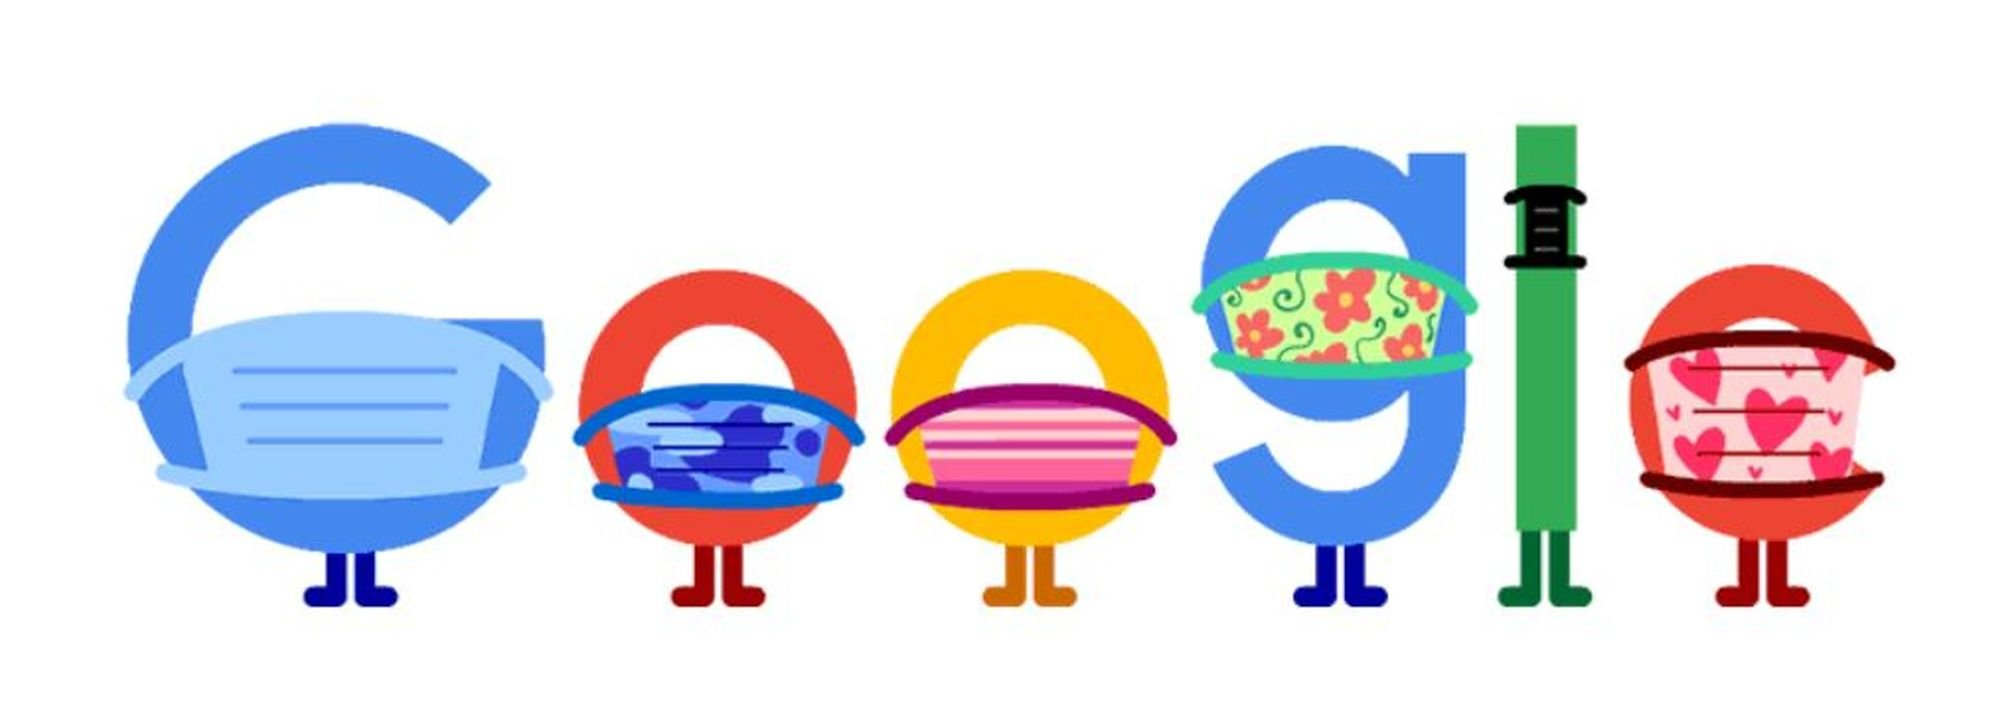 coronavirus tipps trage eine maske doodle